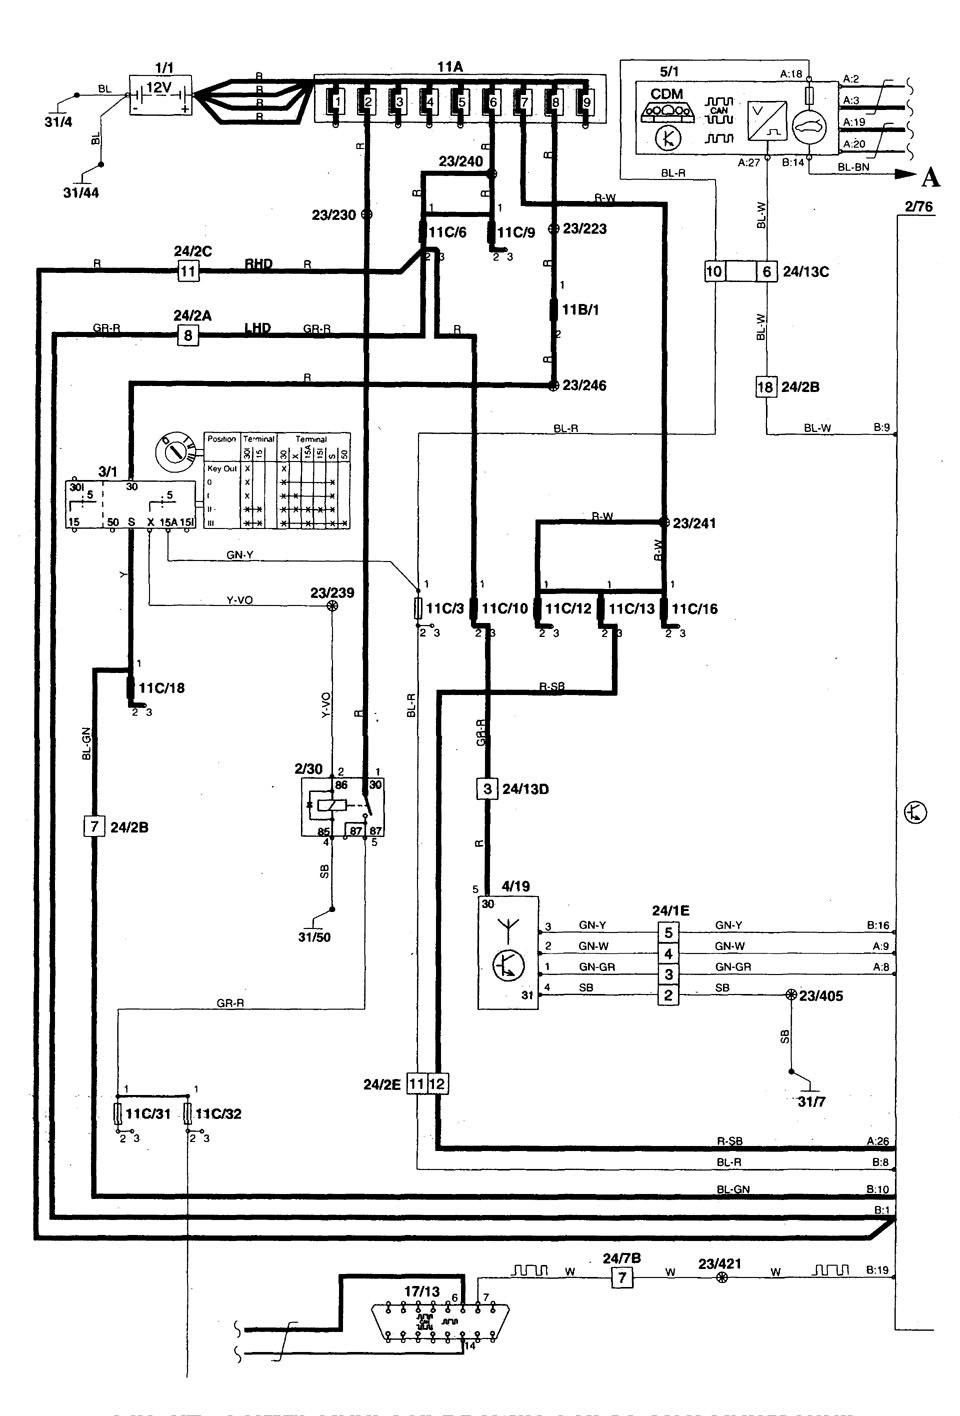 Wiring Diagram Volvo S70 : Volvo c  wiring diagrams power locks